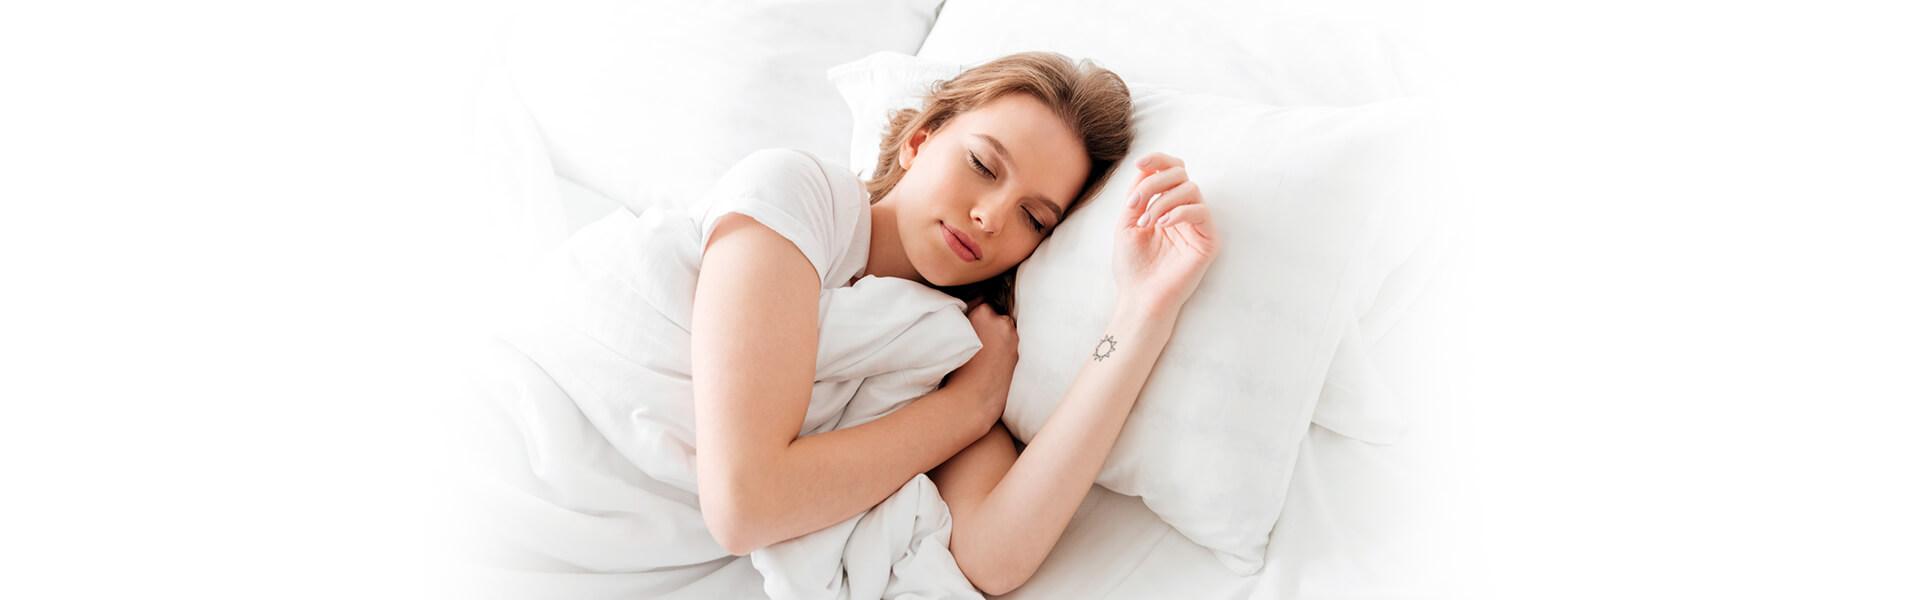 Ramona Dentistry Debunks Seven Common Myths about Sleep Apnea